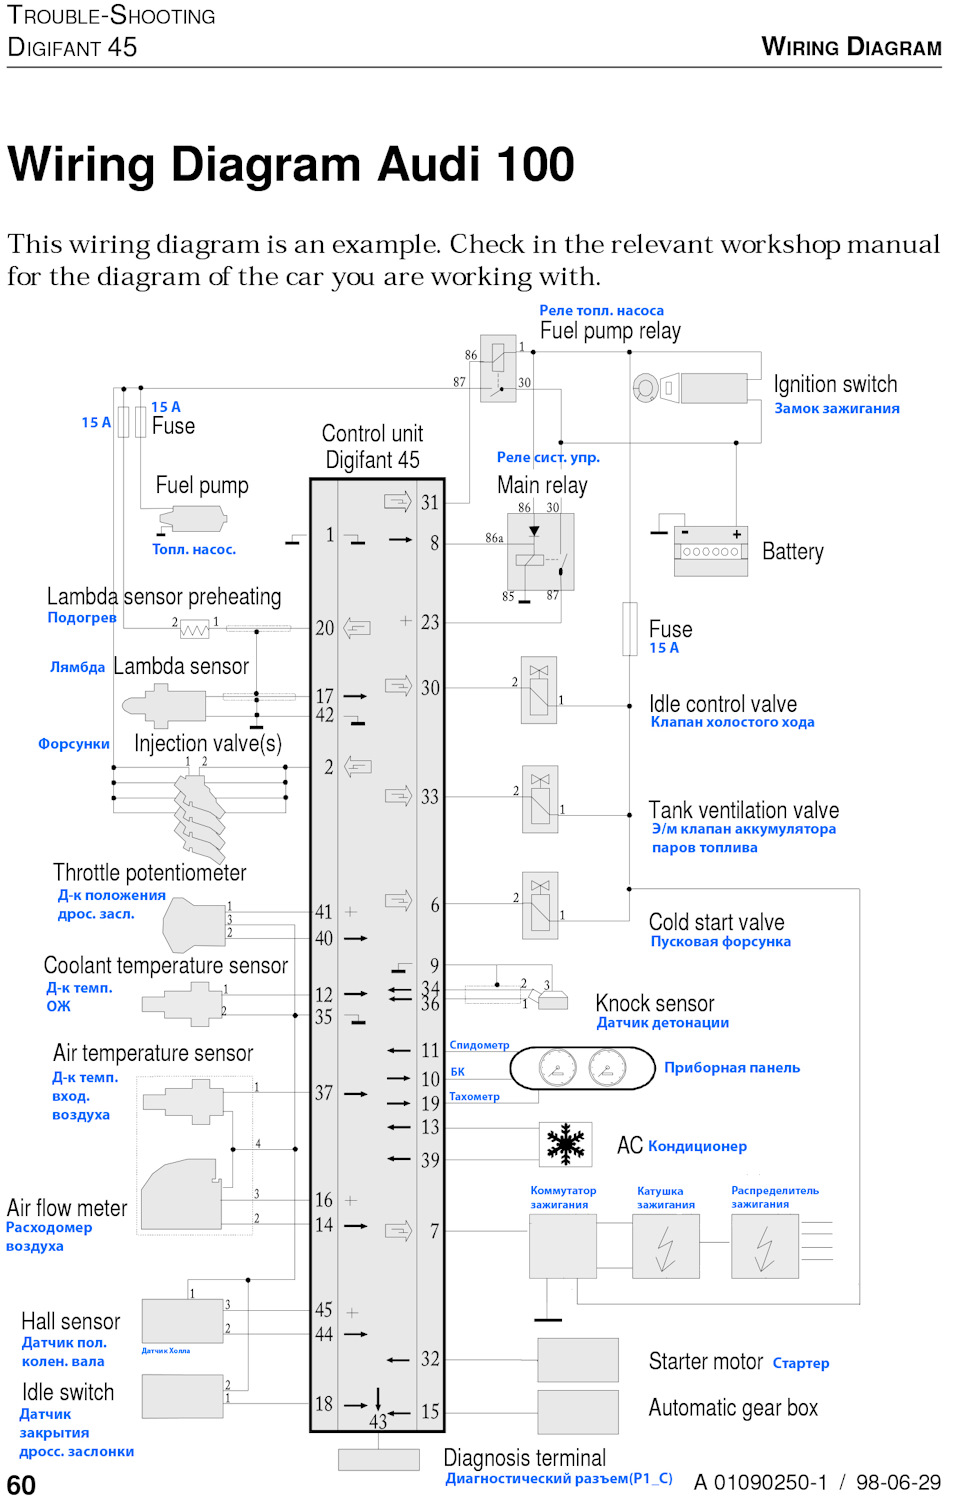 medium resolution of wiring diagram audi 100 c4 engine 2 0 abk